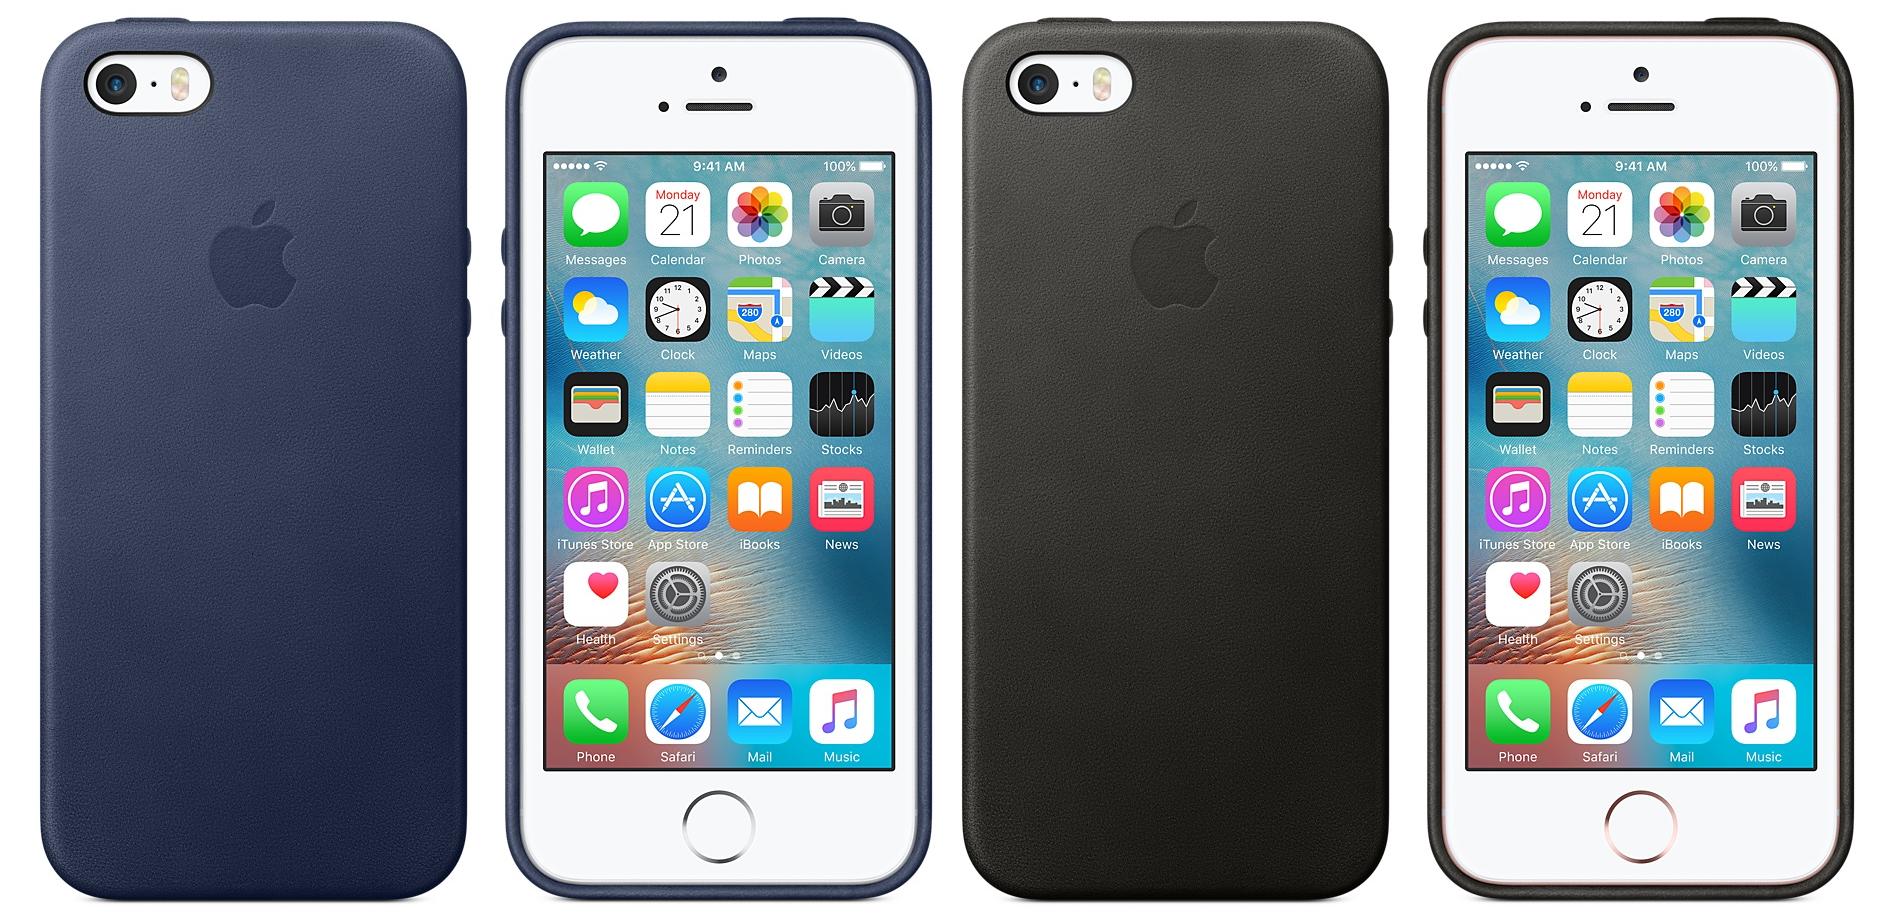 IPhone 6 ( s) Plus hoesjes M Guess Apple iPhone 6 / 6s Plus, telefoonhoesjes kopen?